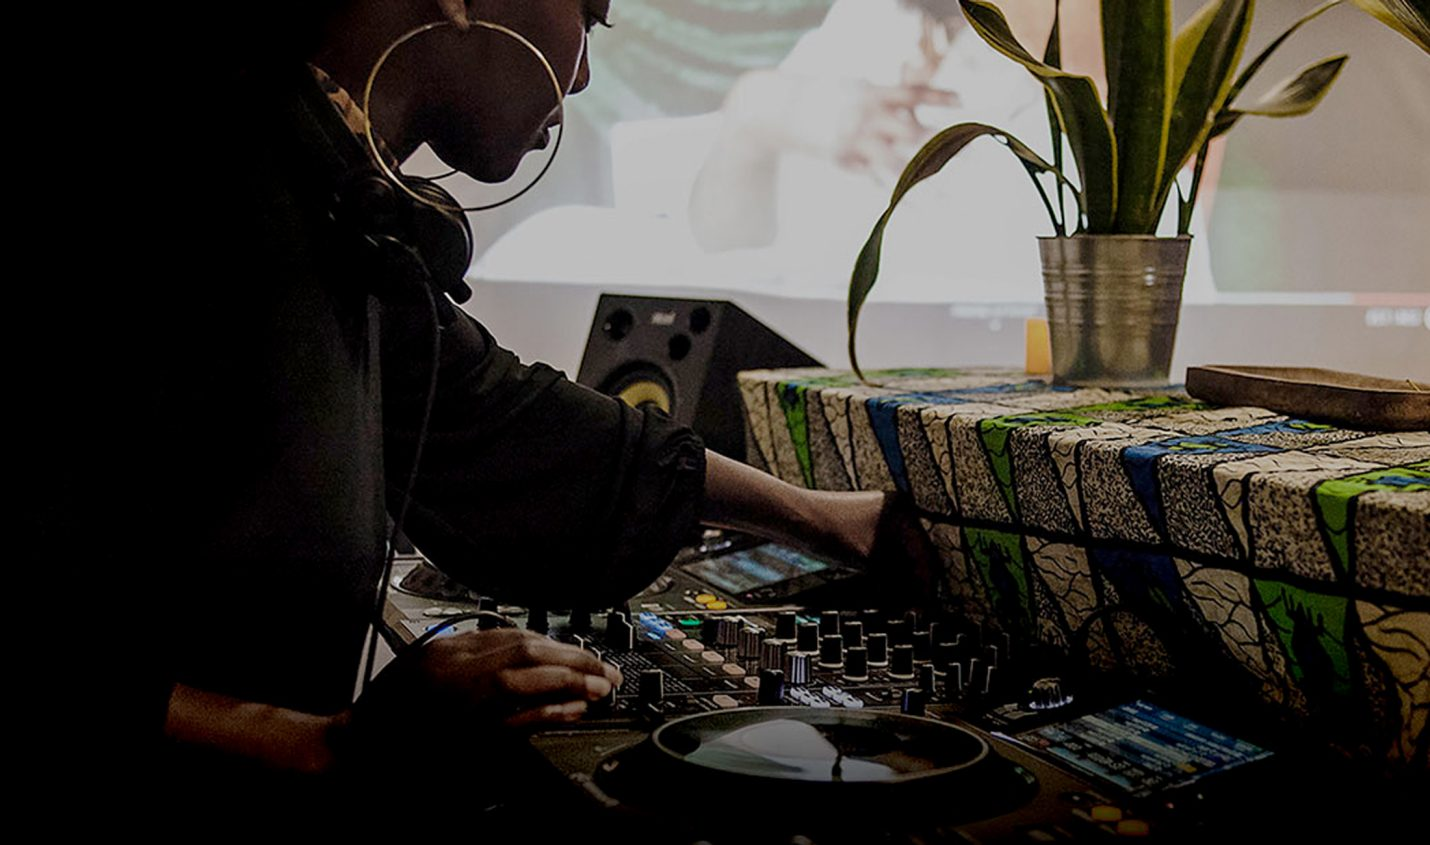 Mixcloud archiviert jetzt auch Livestreams